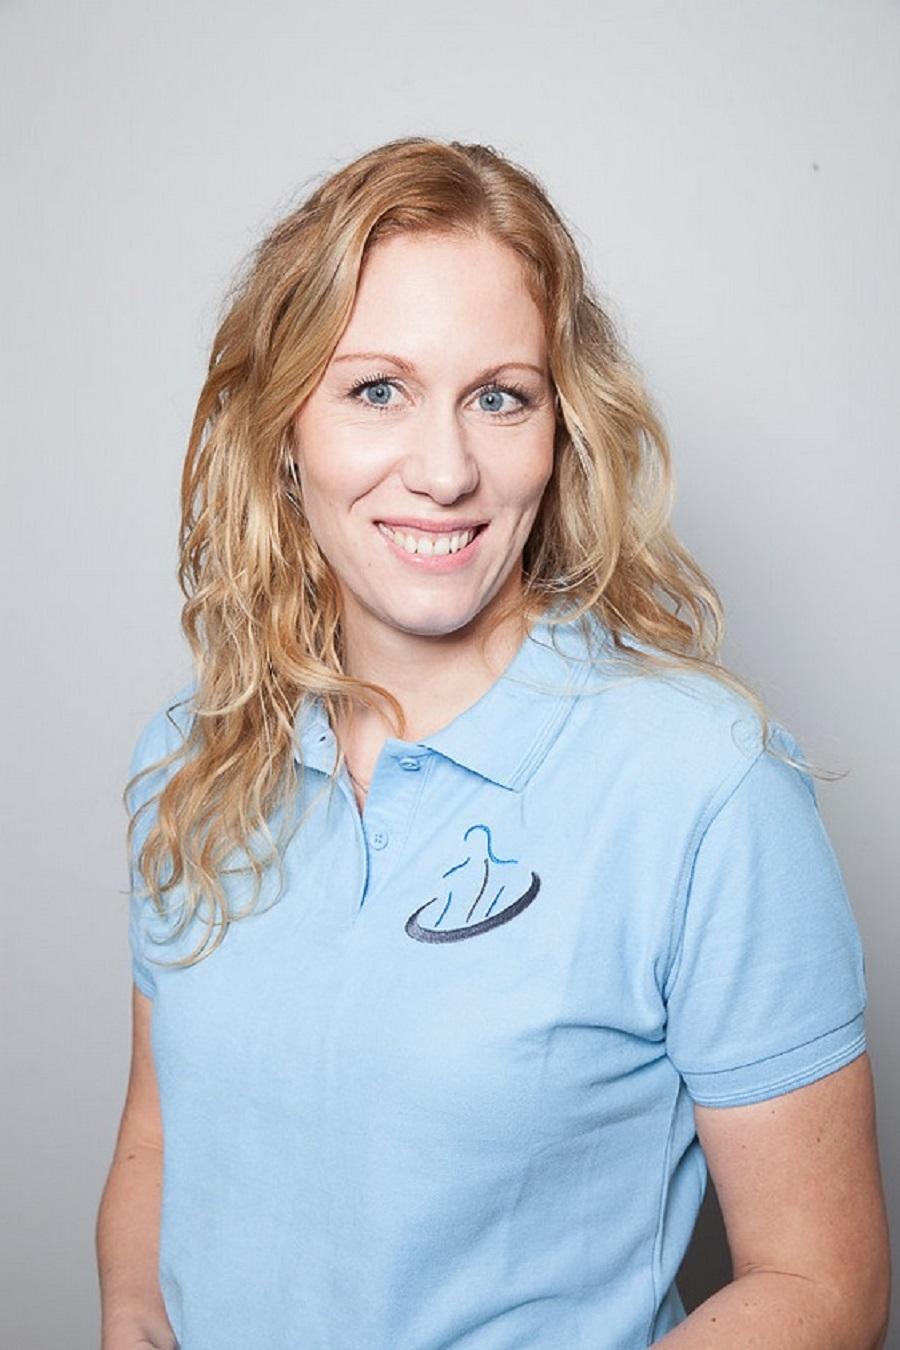 Kiropraktor ved Klinikk Libra på Madla i Stavanger; Camilla Bjørnsen Tjensvoll